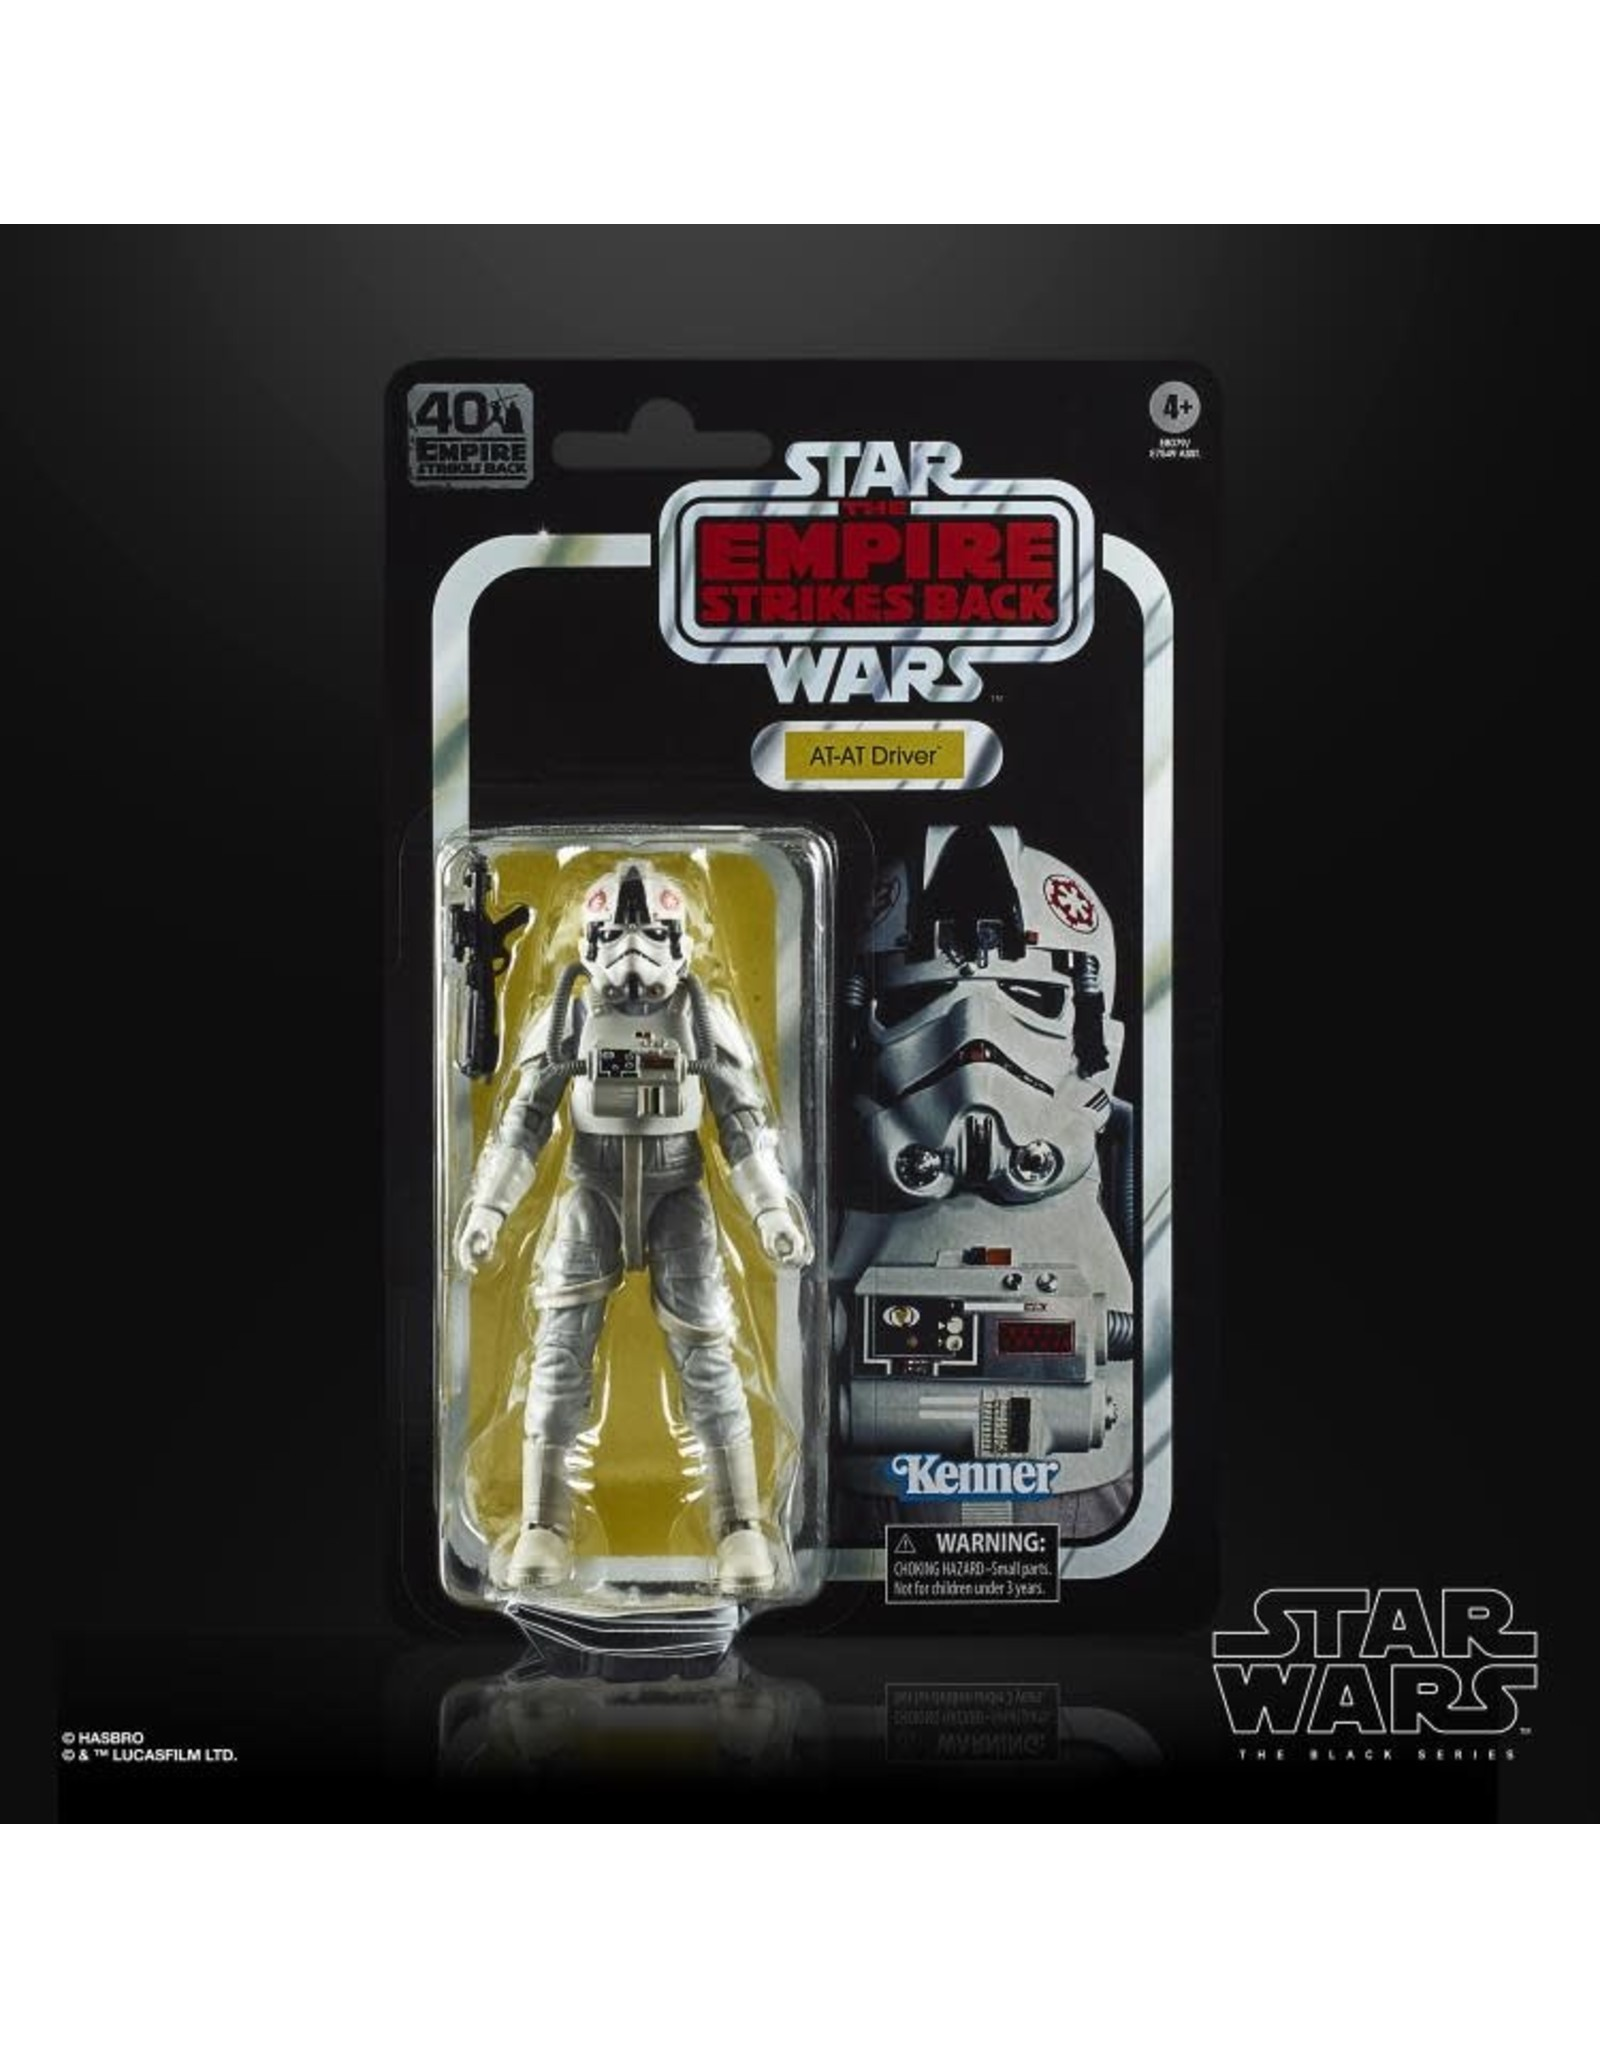 Star Wars Black Series 40th Anniversary Retro Action Figure AT-AT Driver